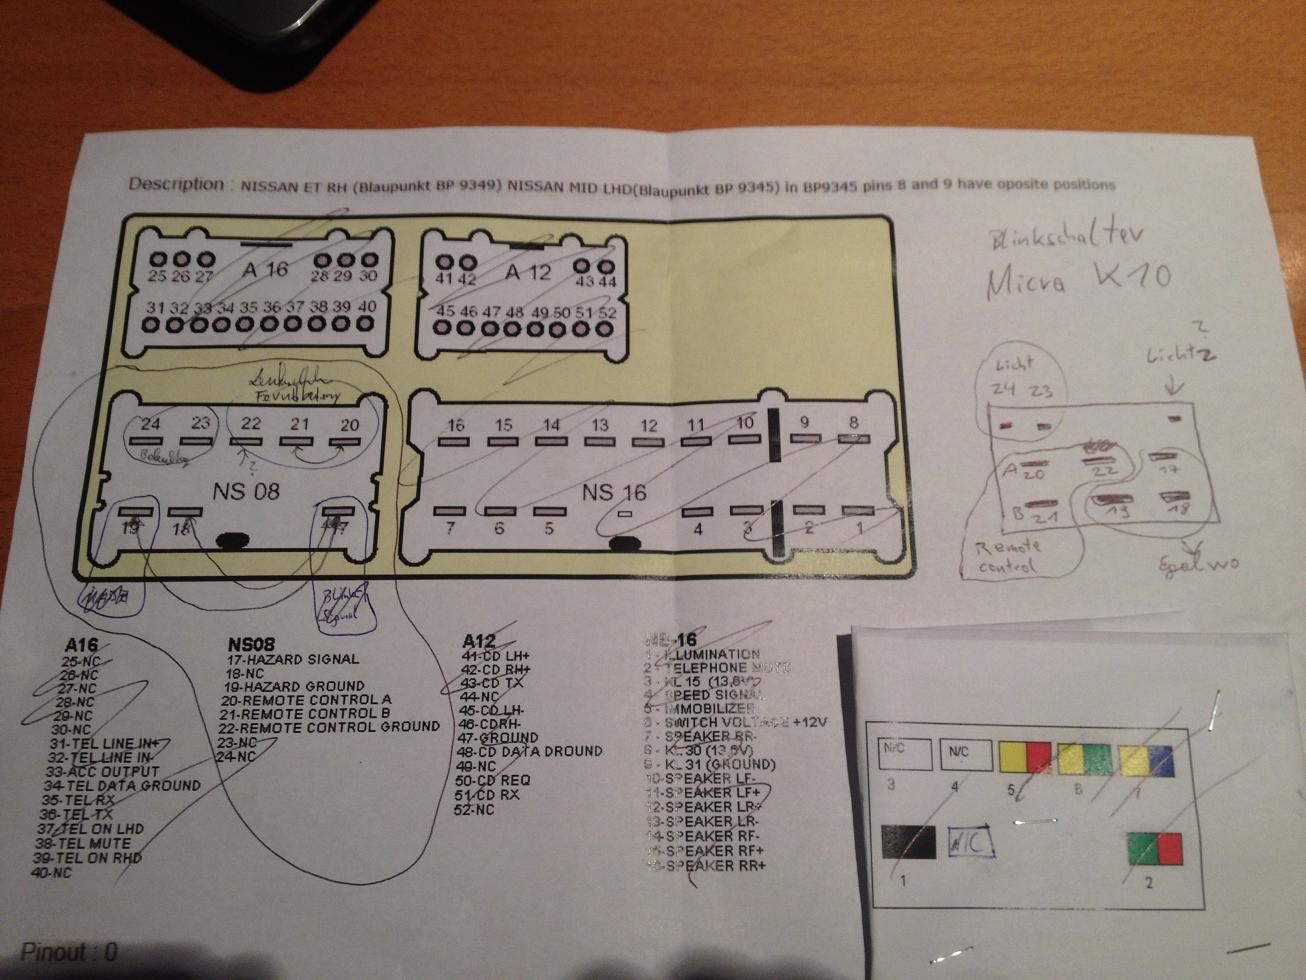 Gemütlich 20 Ps Kohler Motor Schaltplan Ideen - Schaltplan Serie ...